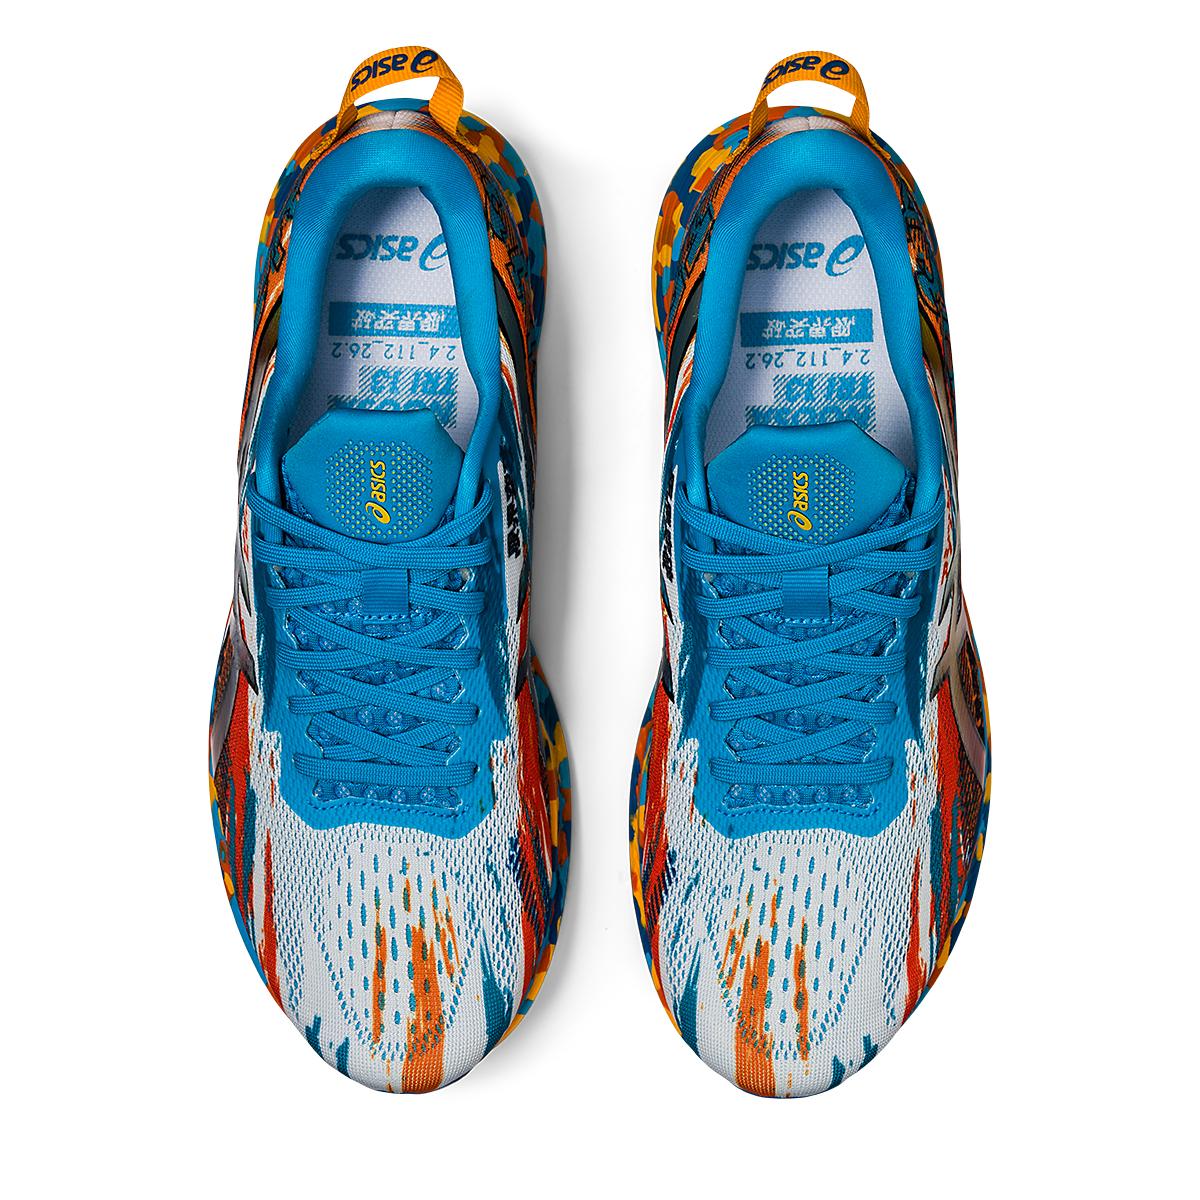 Men's Asics Noosa Tri 13 Running Shoe - Color: Digital Aqua/Ma - Size: 7 - Width: Regular, Digital Aqua/Ma, large, image 7